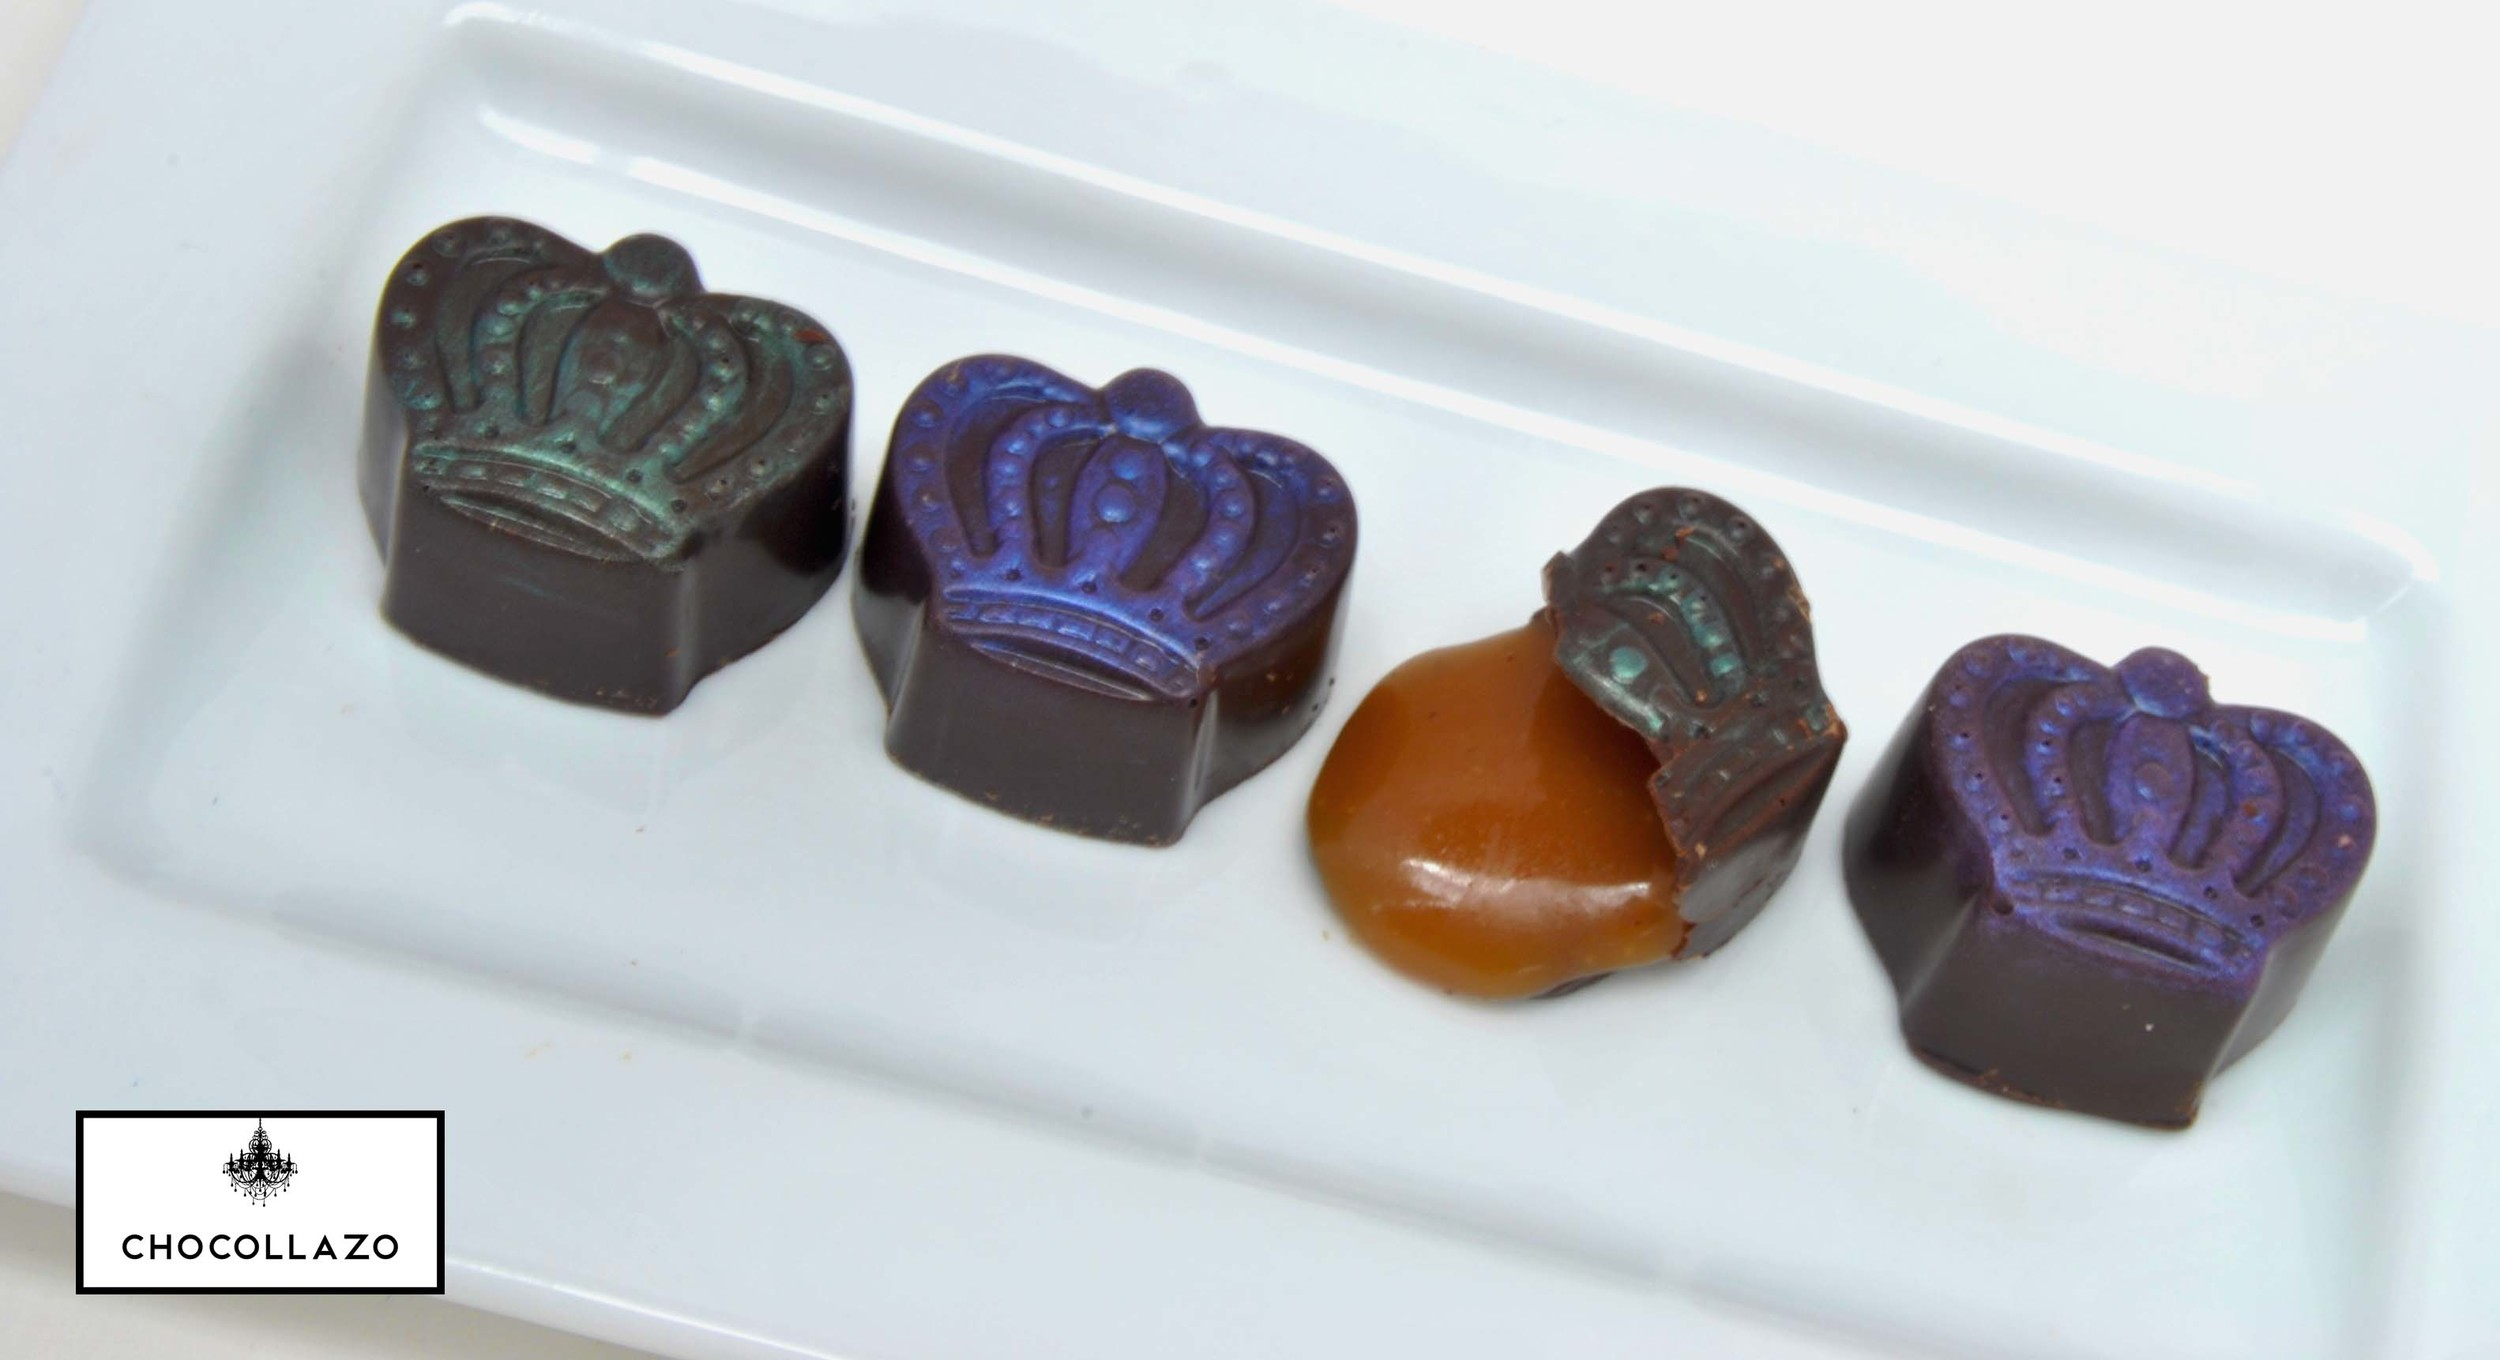 Chocolate Caramel Truffle